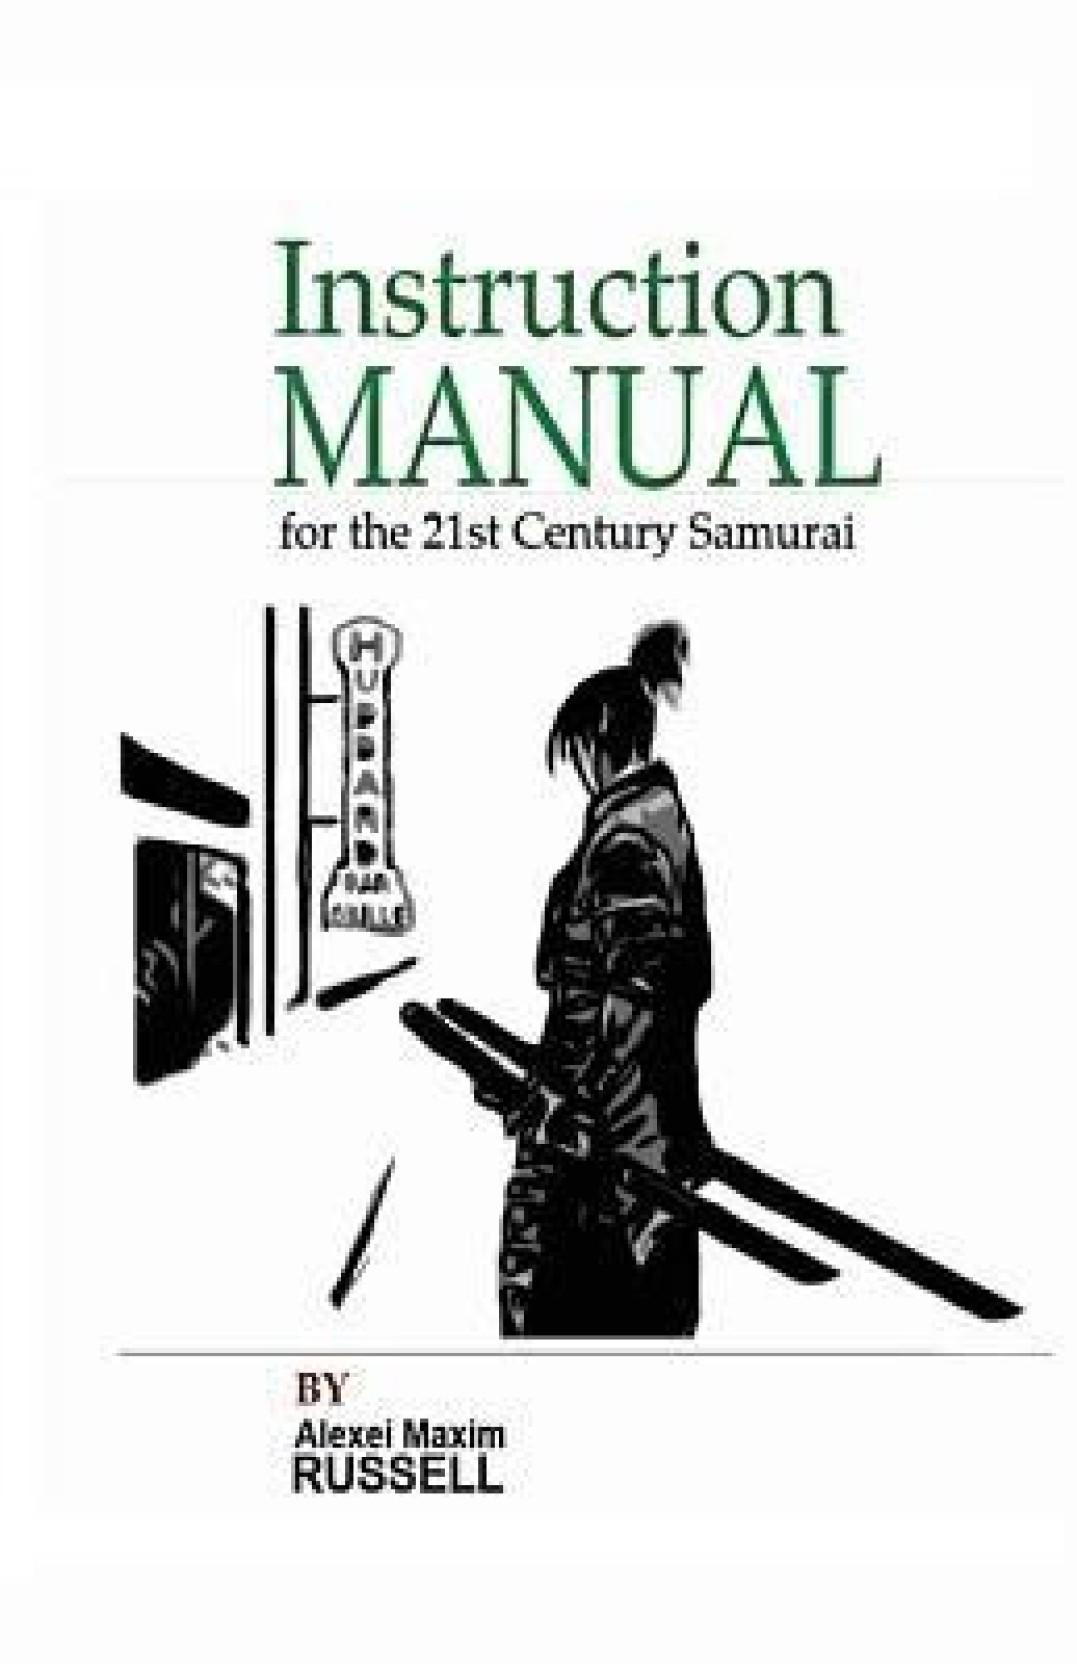 Instruction Manual for the 21st Century Samurai. Share